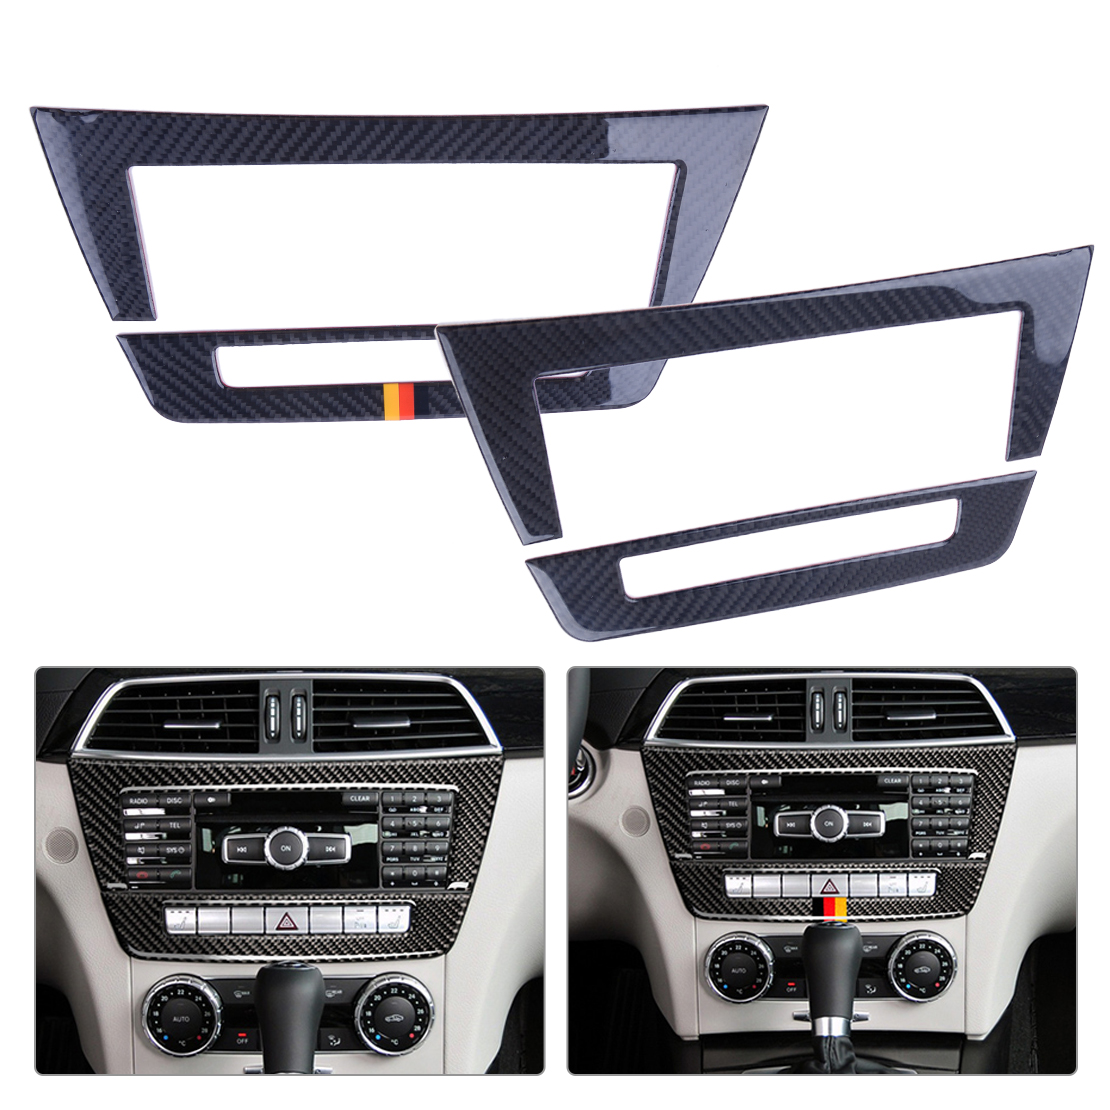 beler 2pcs Car Central Control CD Panels Decor Decorative Sticker Cover Trim Frame Fit For Mercedes Benz W204 2010 2013